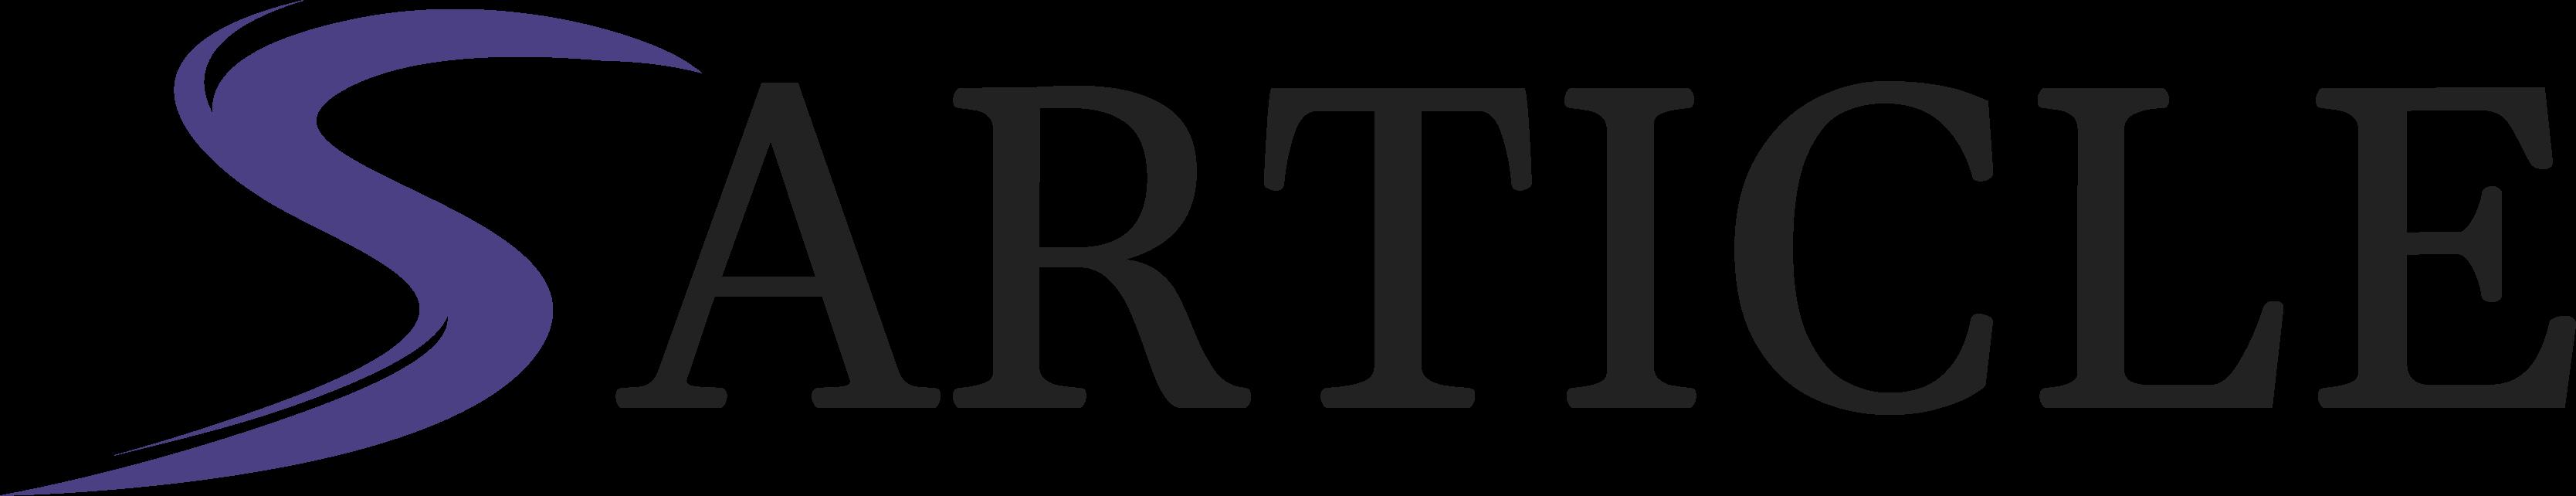 SArticle Logo